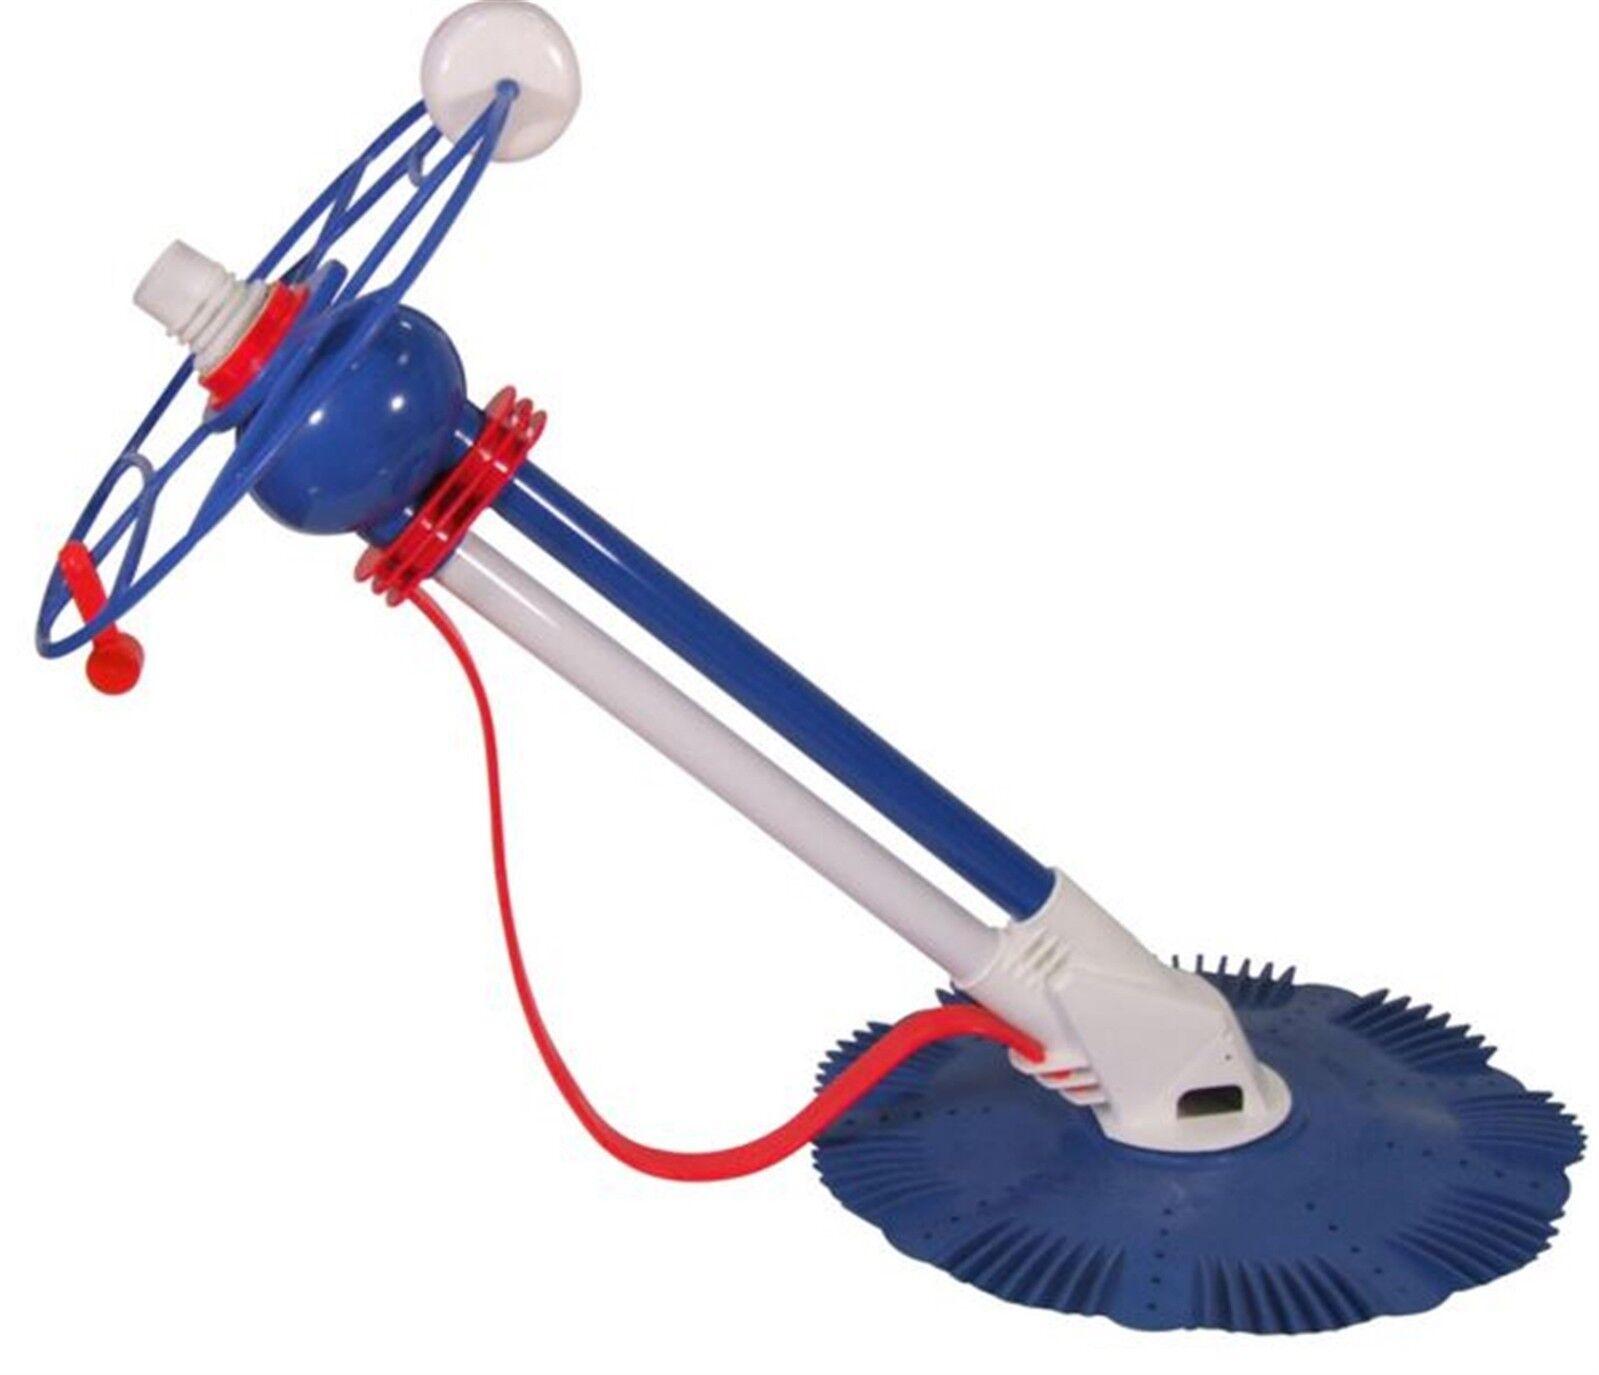 Blau Wave 17.5-in Suction Pool Vacuum Cleaner Maintenance Equipment Outdoor